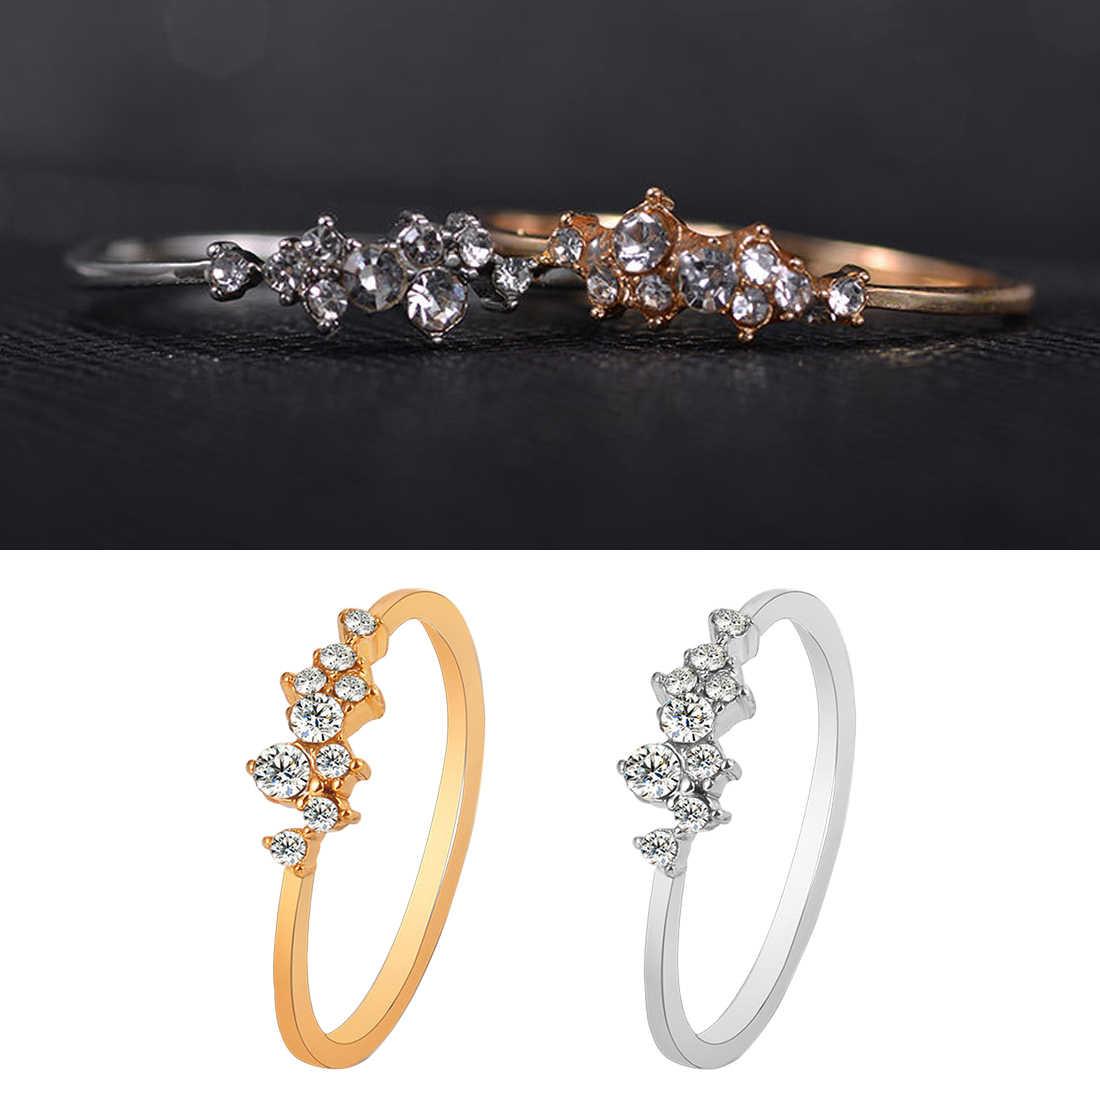 Perhiasan Berlian Imitasi Kristal Opal Cincin Ukuran Yang Berbeda Hot Sale Dilapisi Sembilan Cincin Elegan Fashion Wanita Cincin